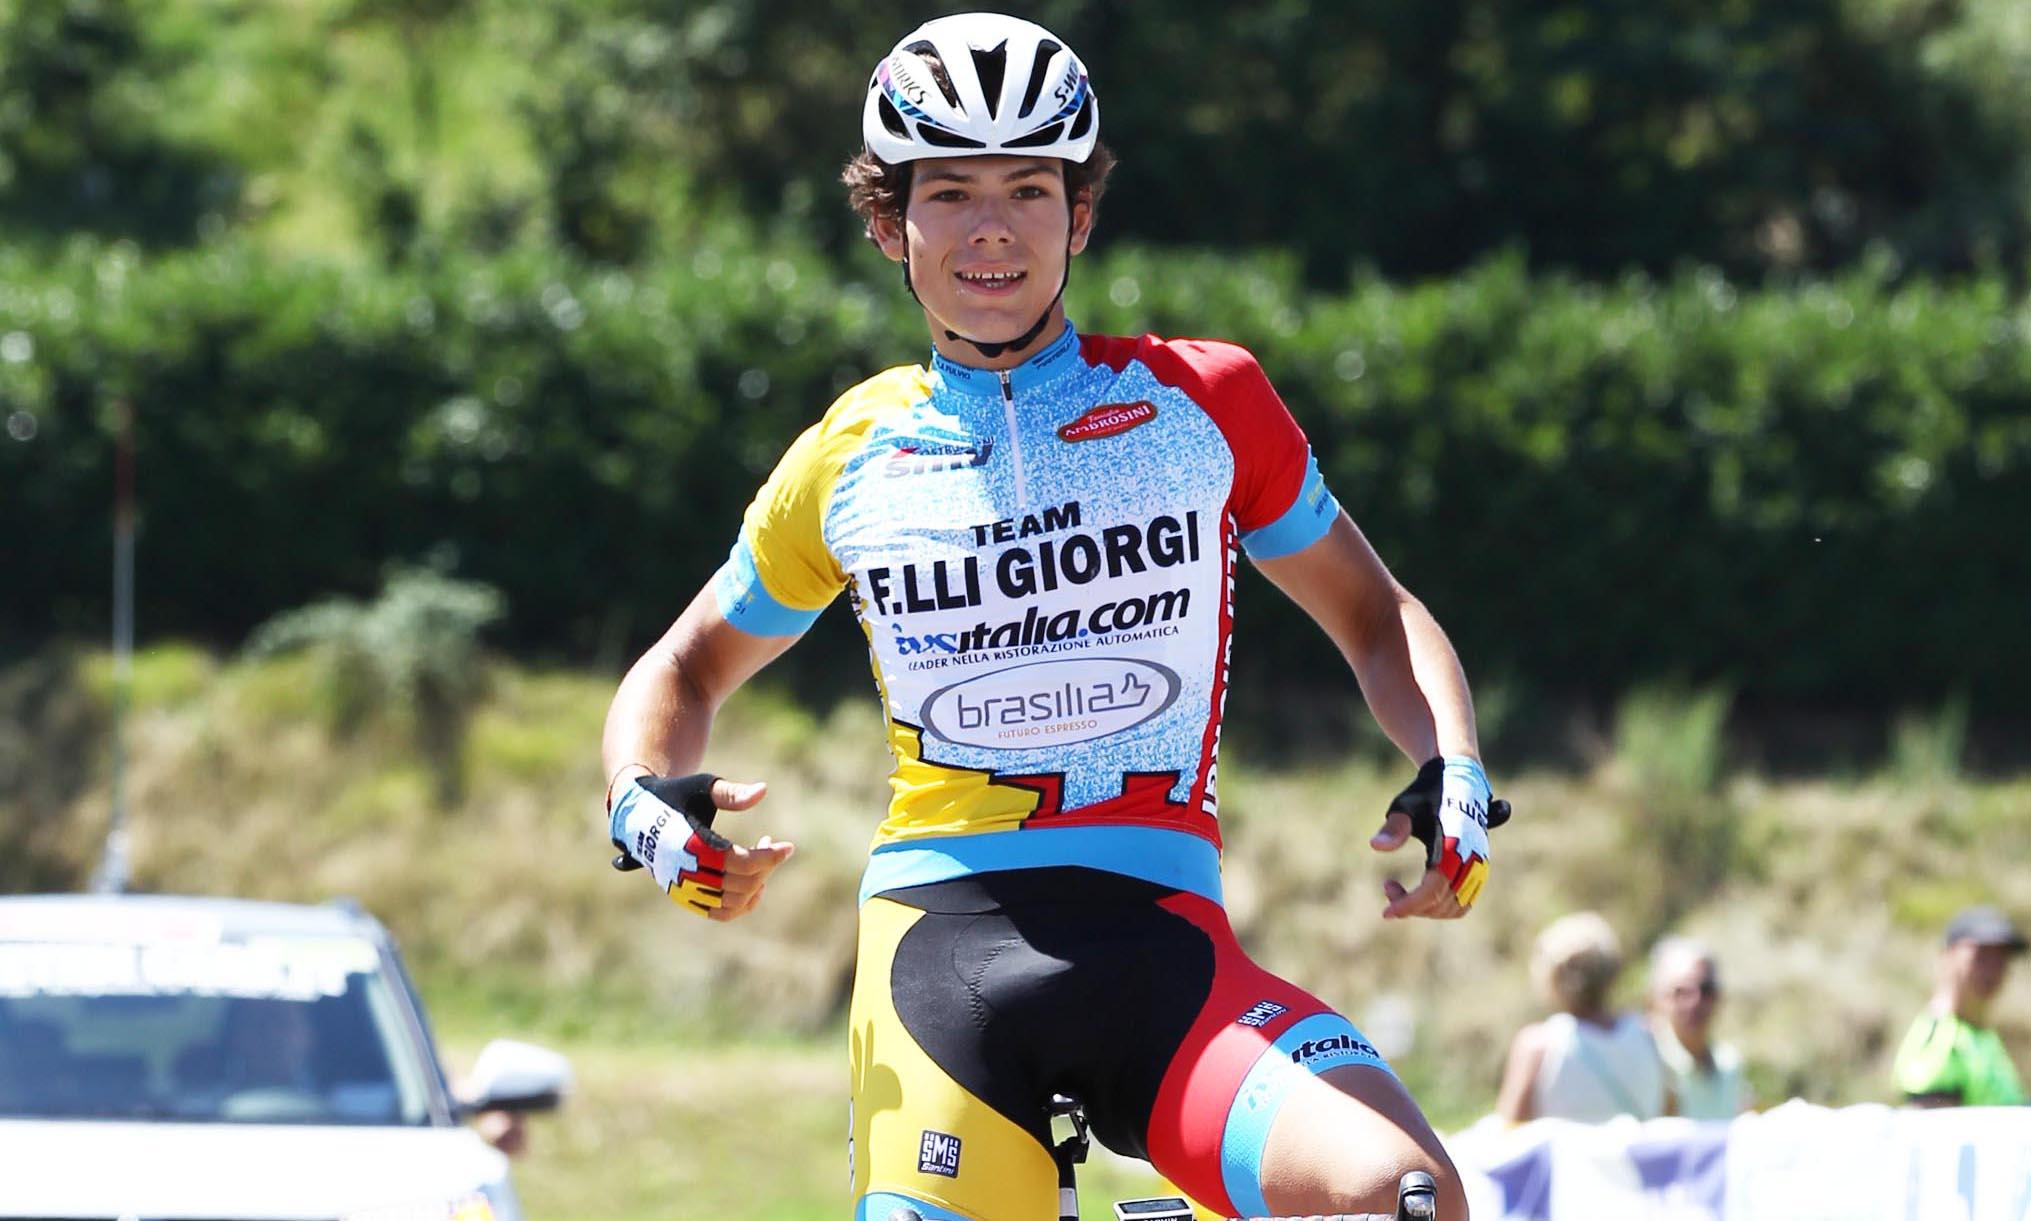 Lorenzo Balestra vince Il Lombardia Giovani Allievi 2018